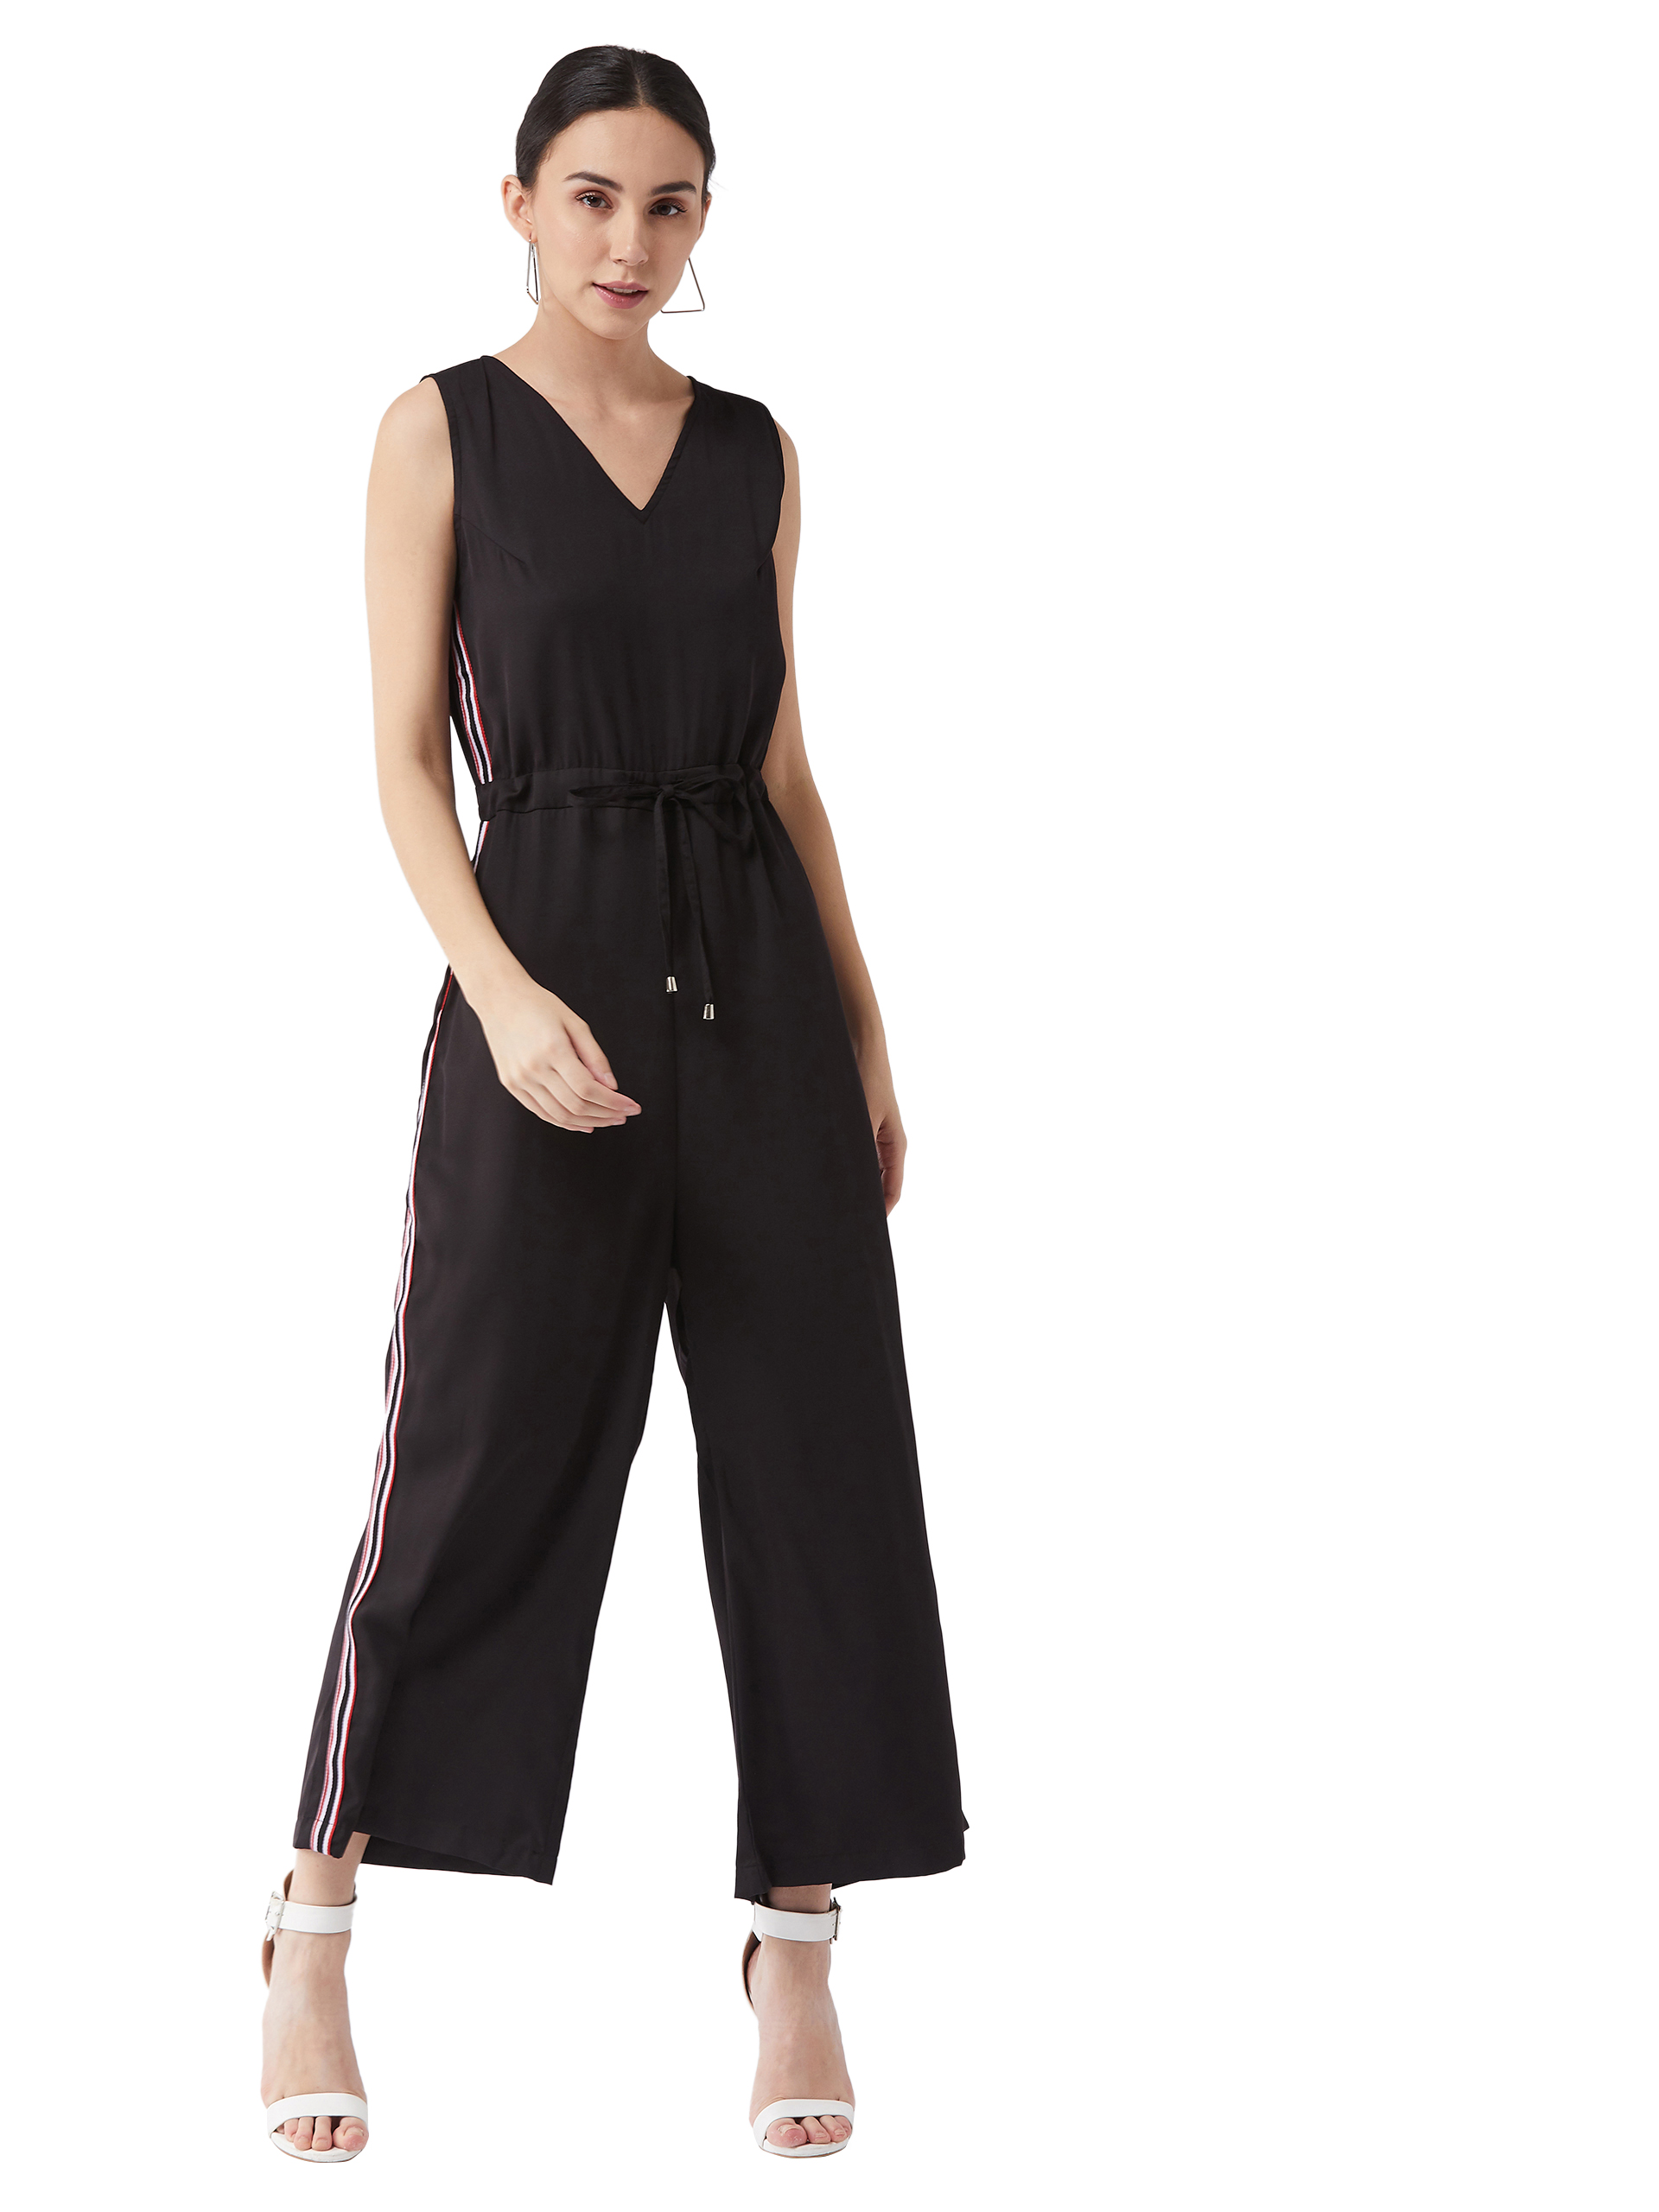 MISS CHASE |  Black V-Neck Sleeveless Solid Straight Leg Jumpsuit